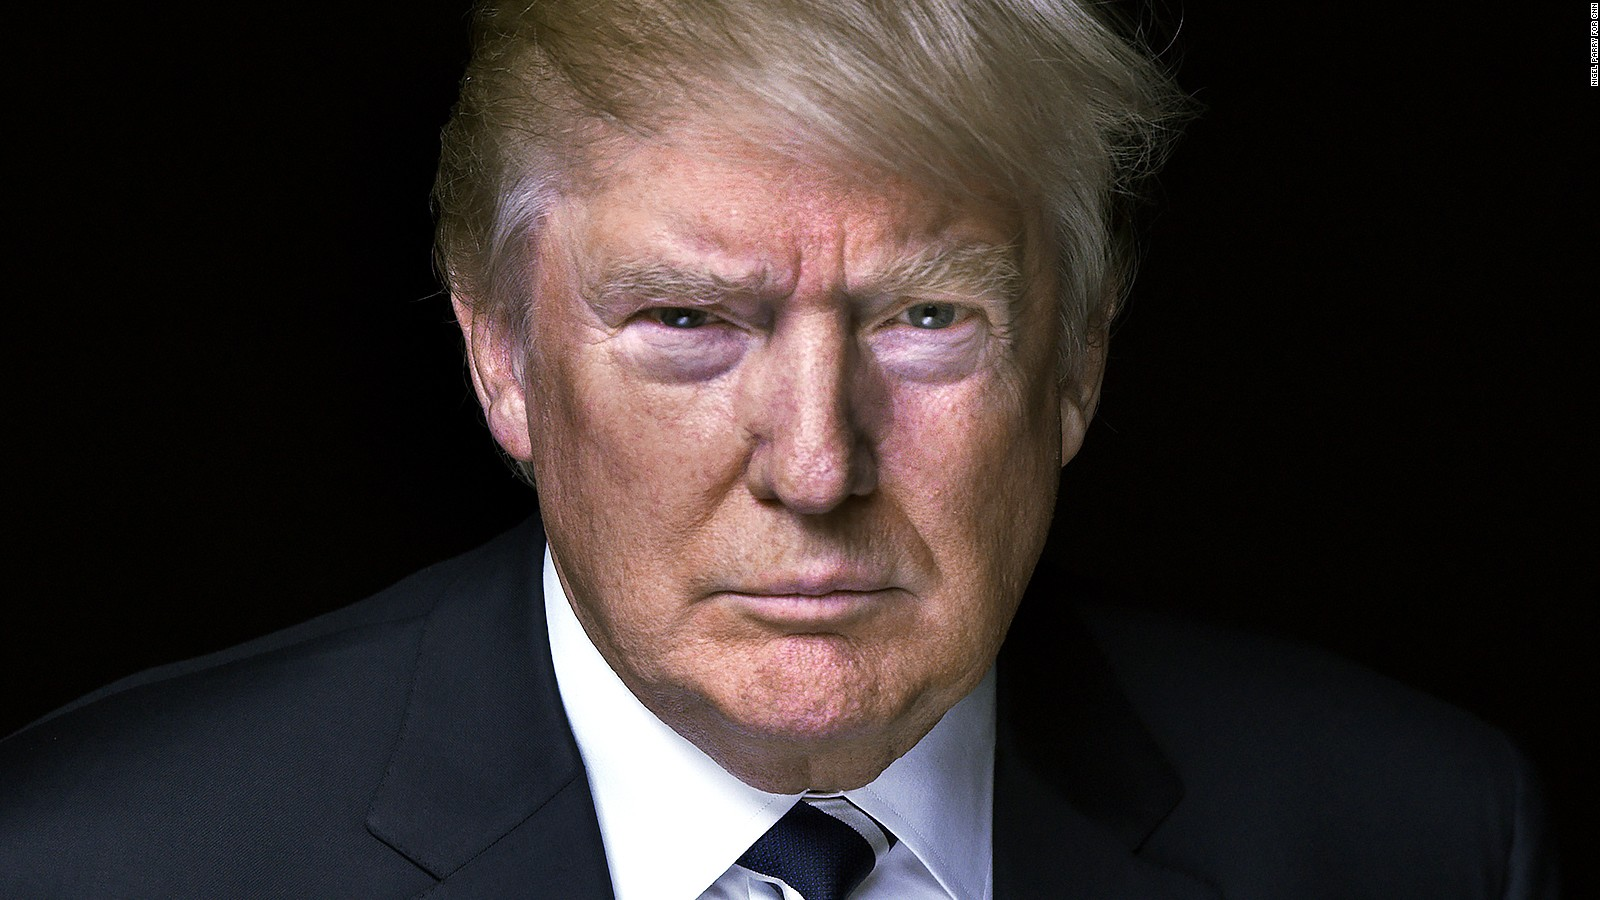 DonaldTrumpHeadshot2